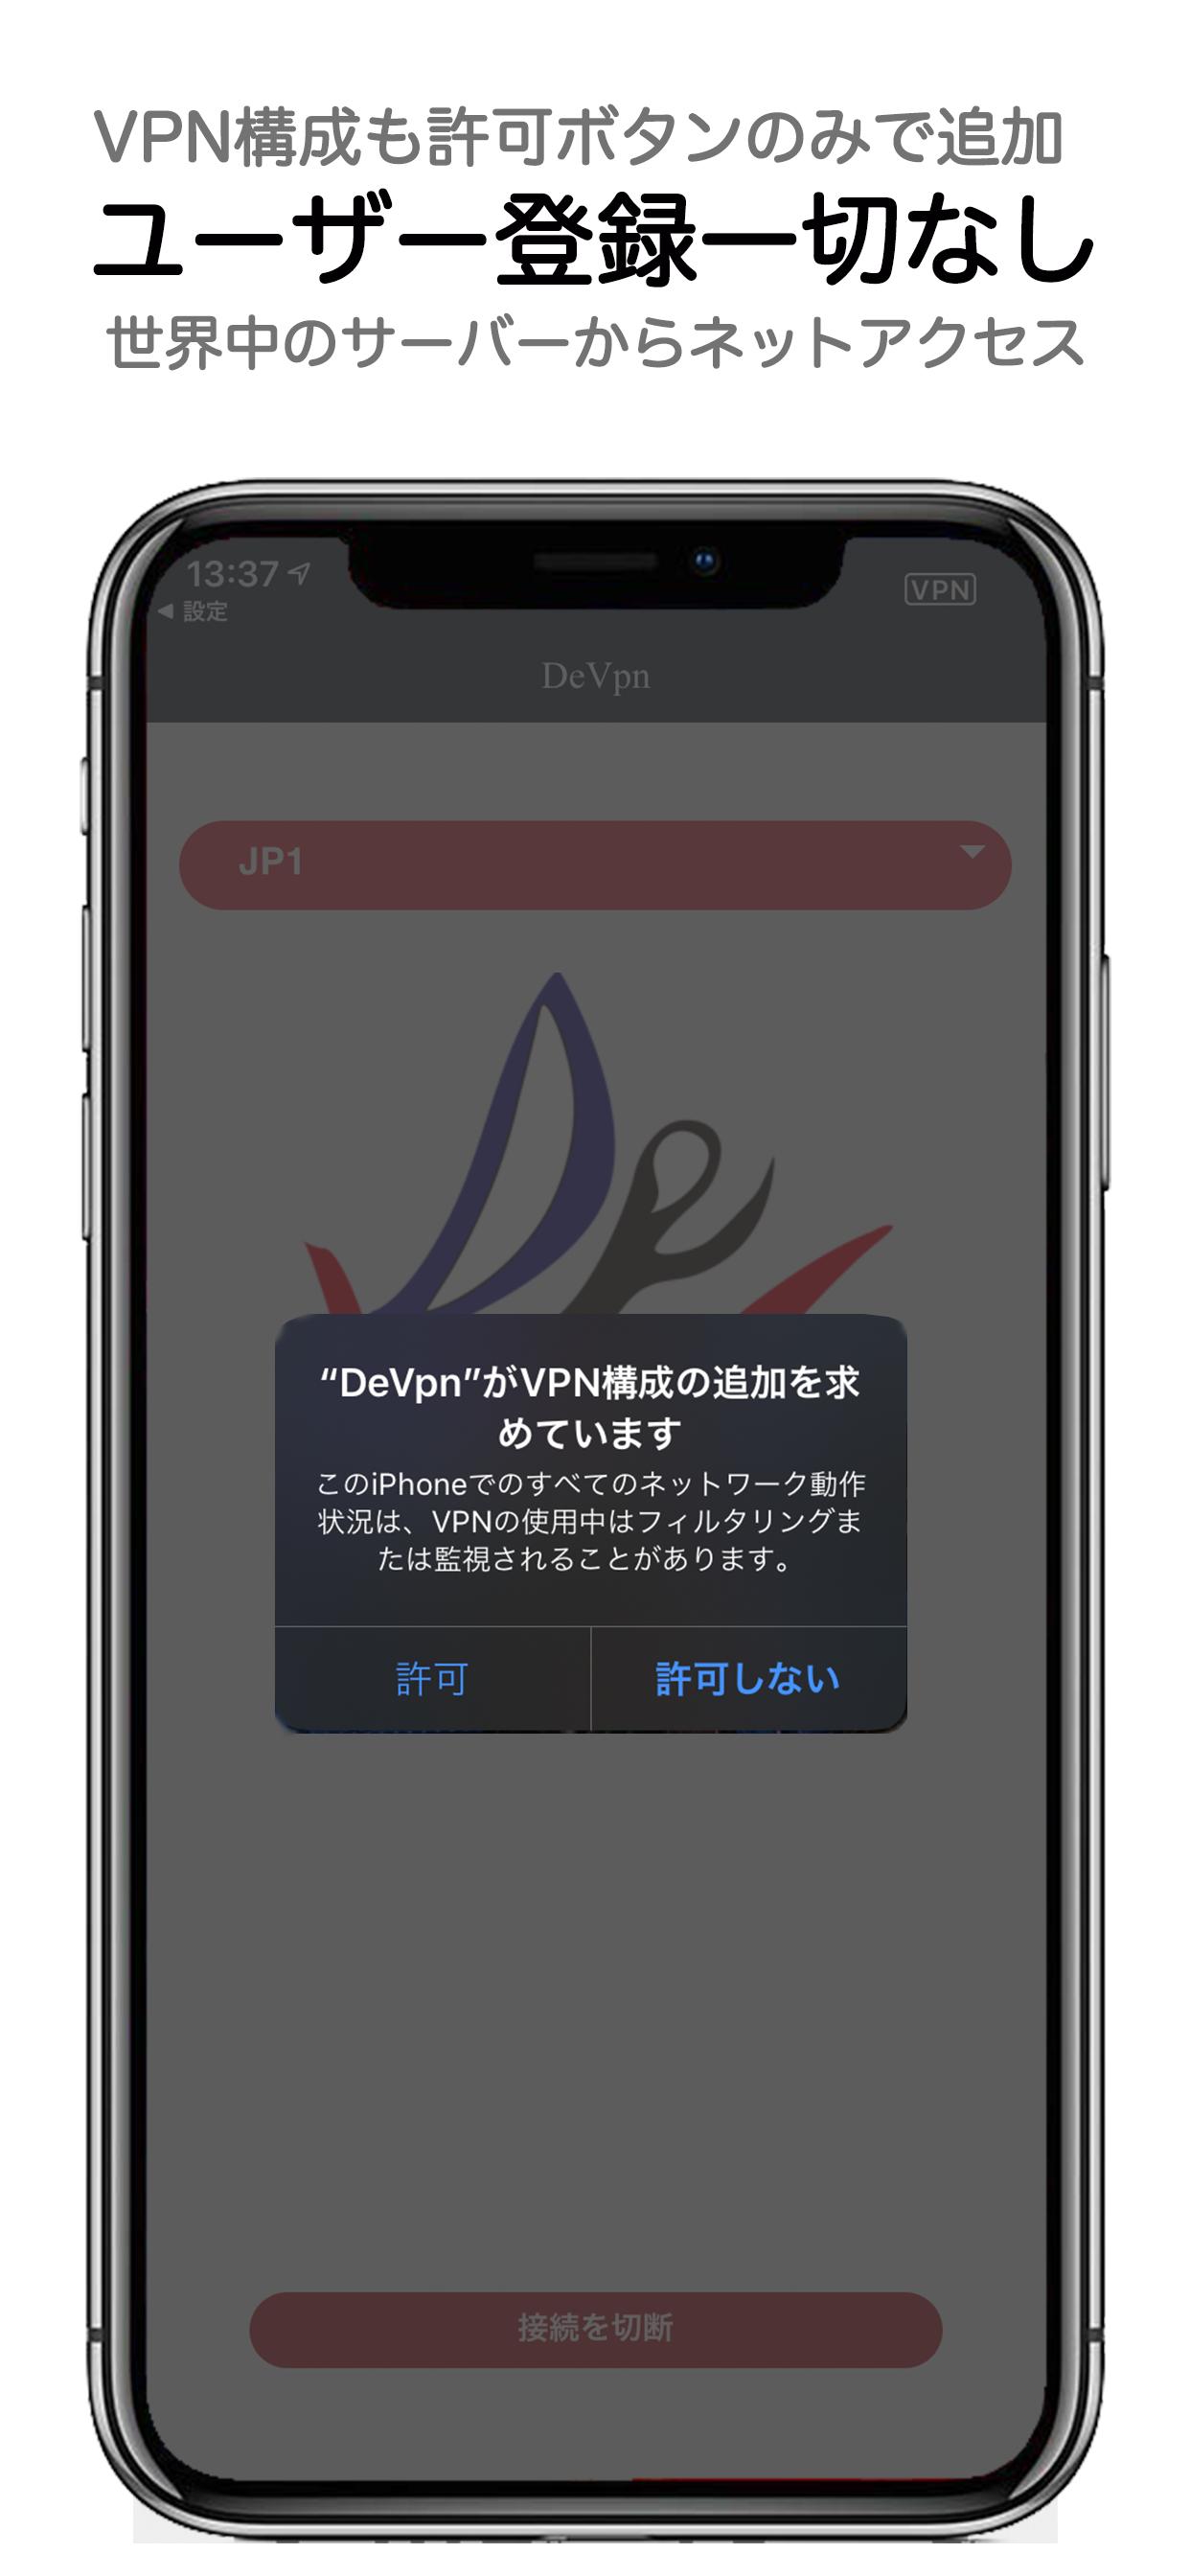 DeVpn 無料VPN ユーザー登録一切なし